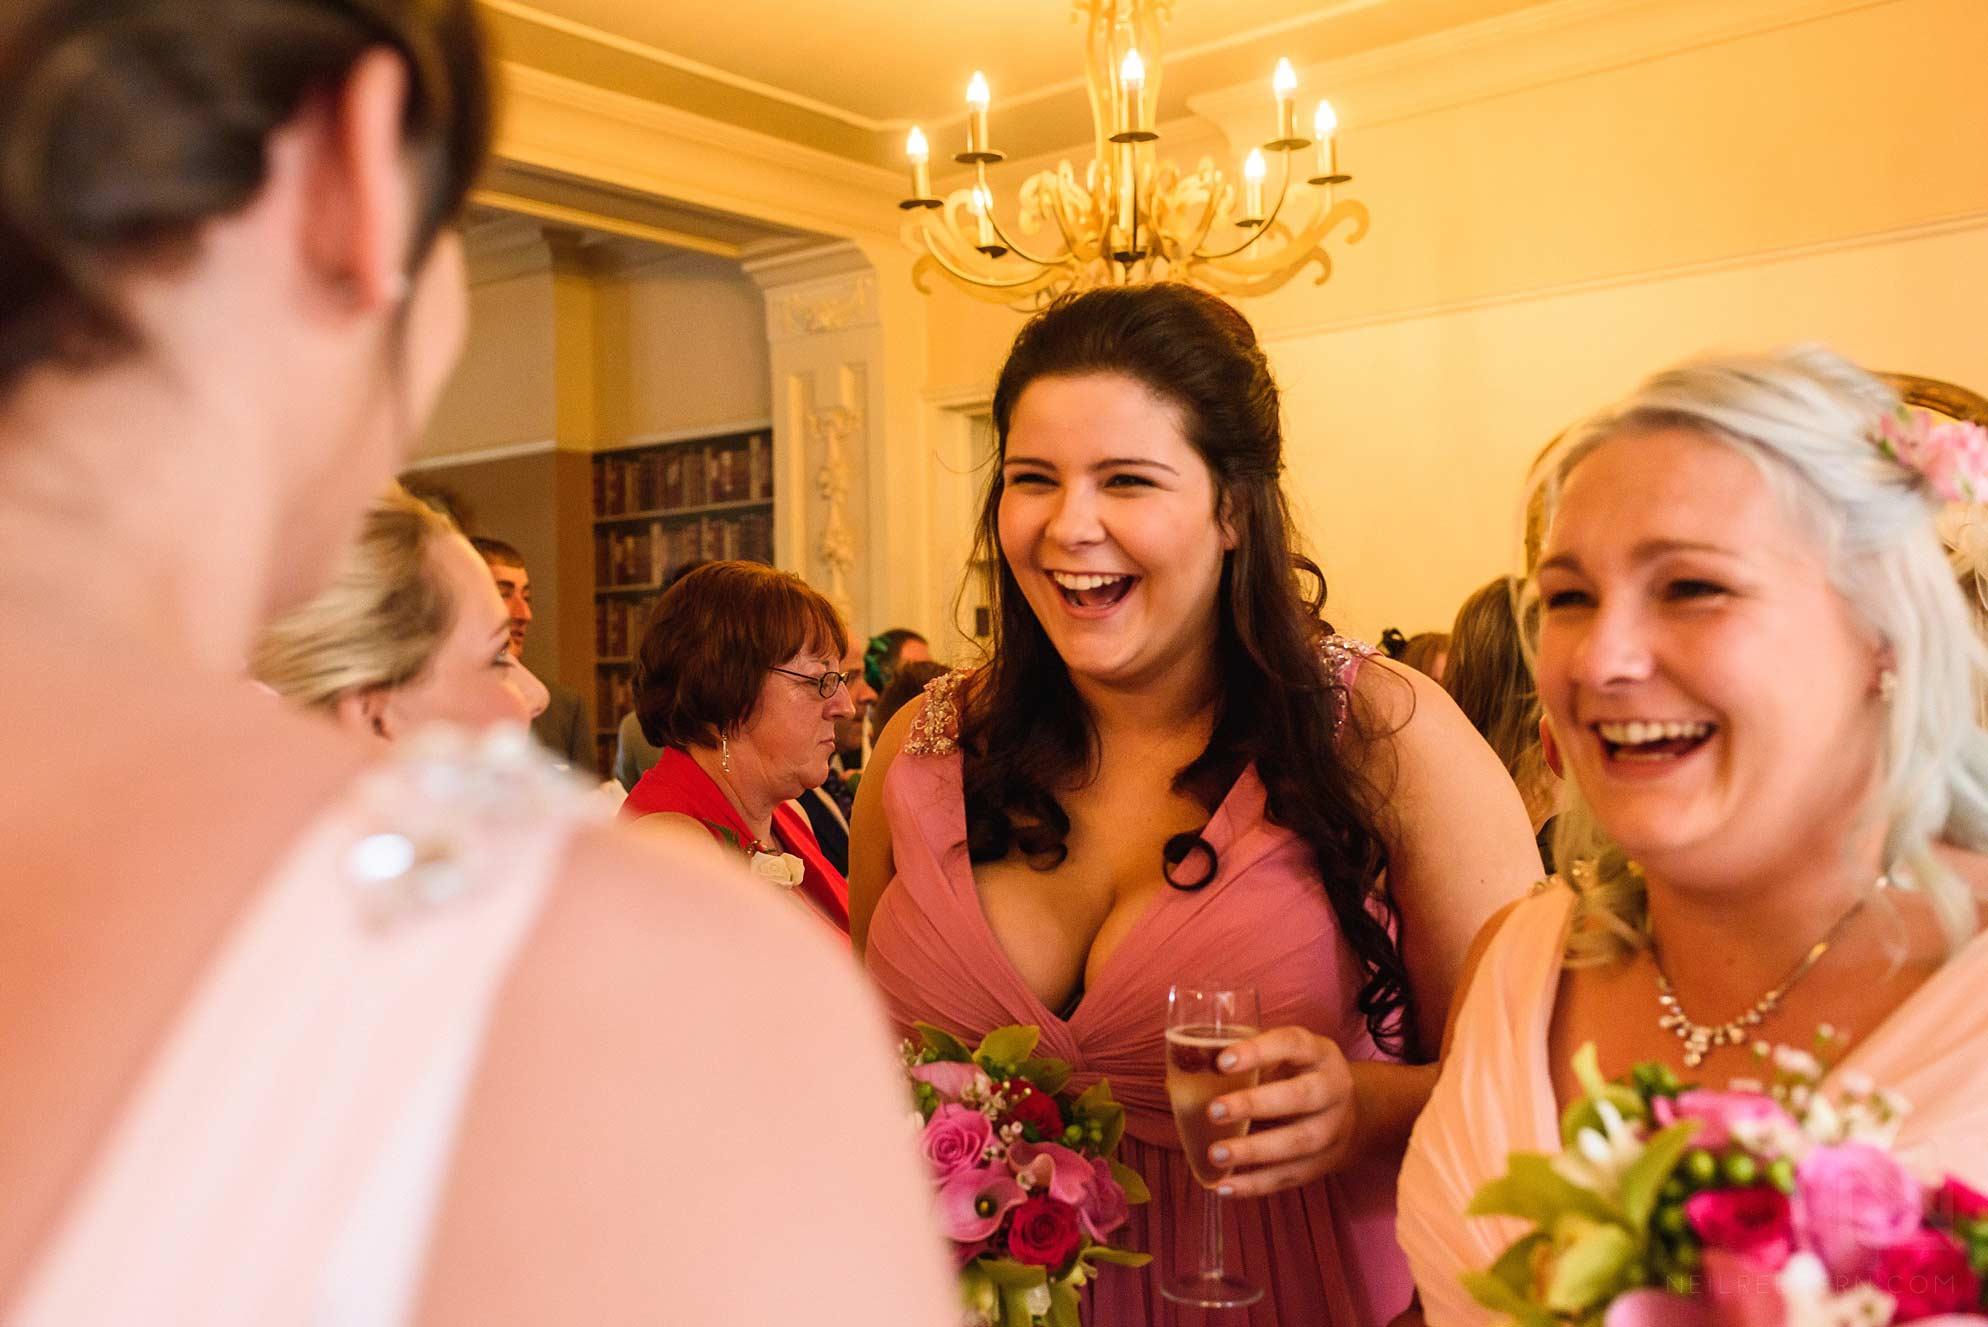 Metropole-Hotel-Llandrindod-Wells-wedding-20